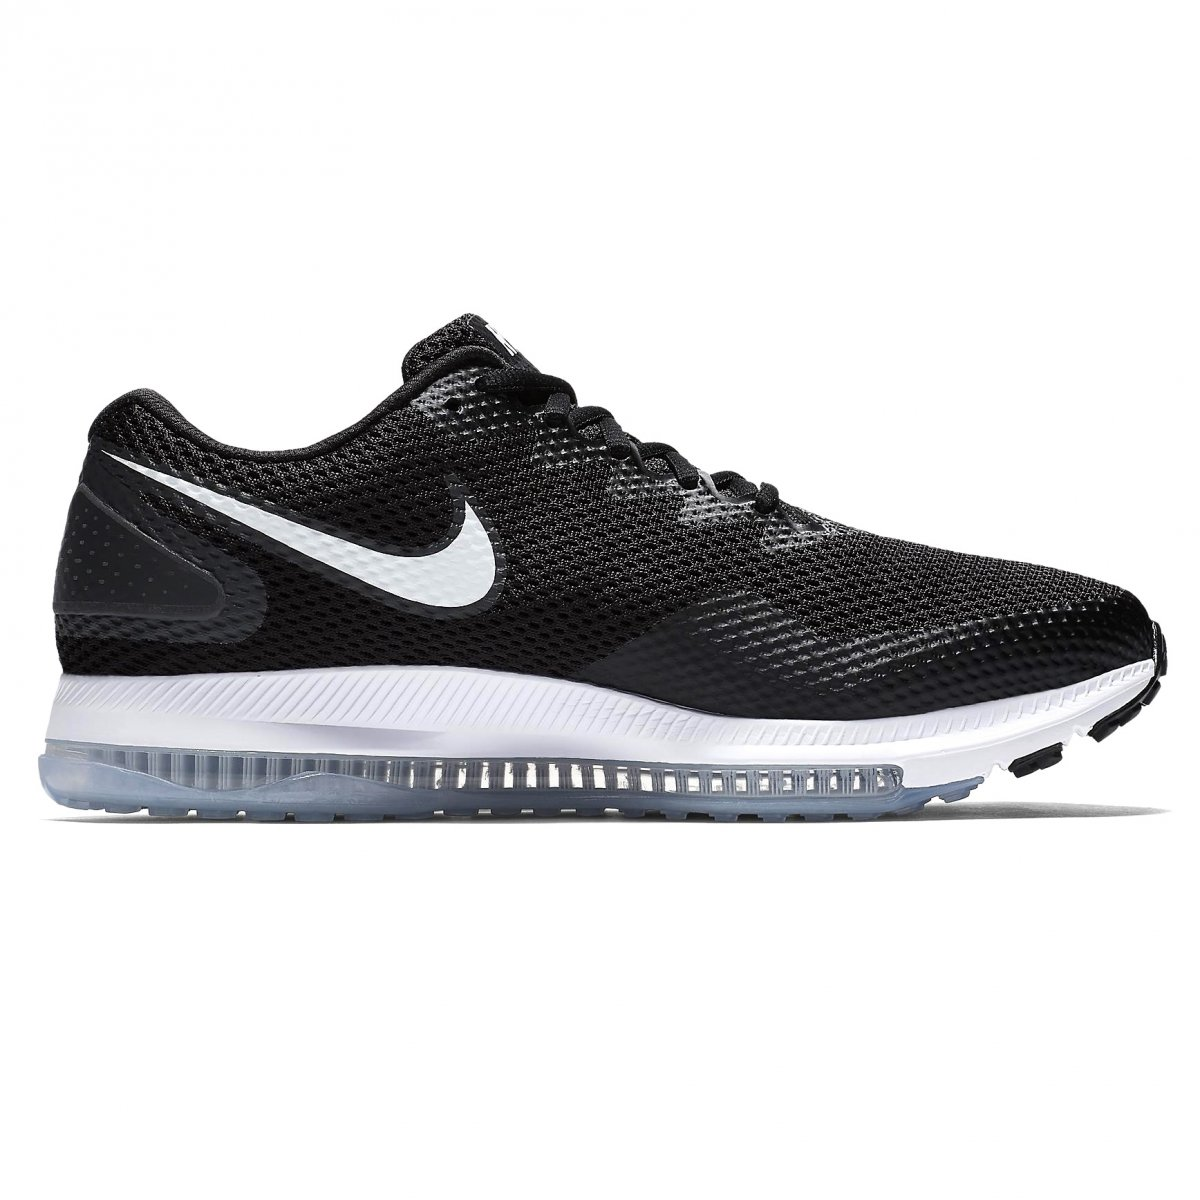 29888fb239 Tênis Nike Zoom All Out Low 2 Masculino AJ0035-003 - Preto Branco ...